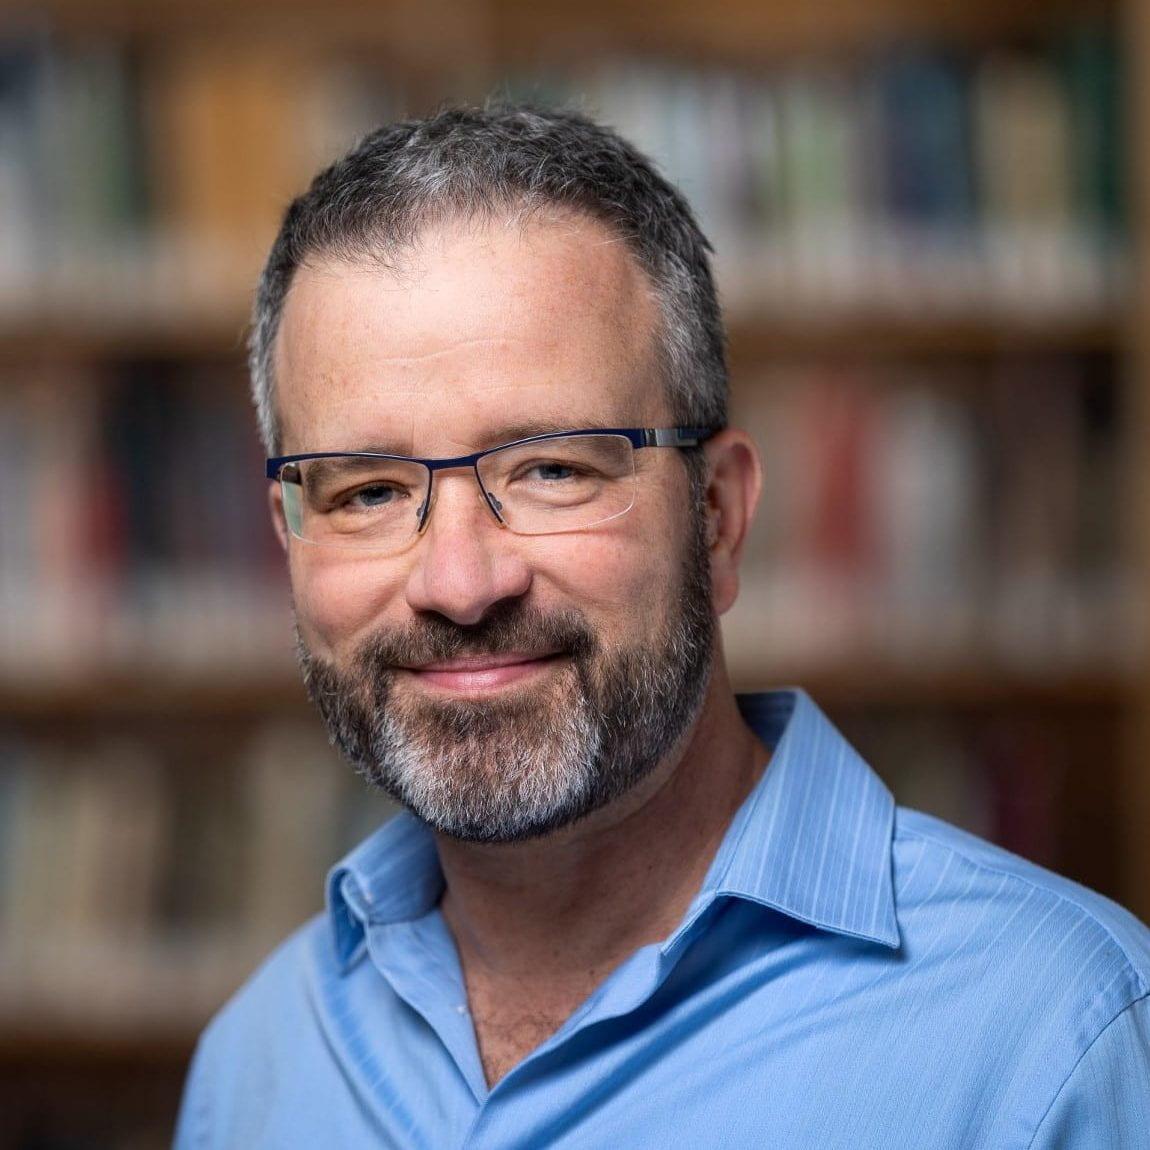 Laurence C. Smith